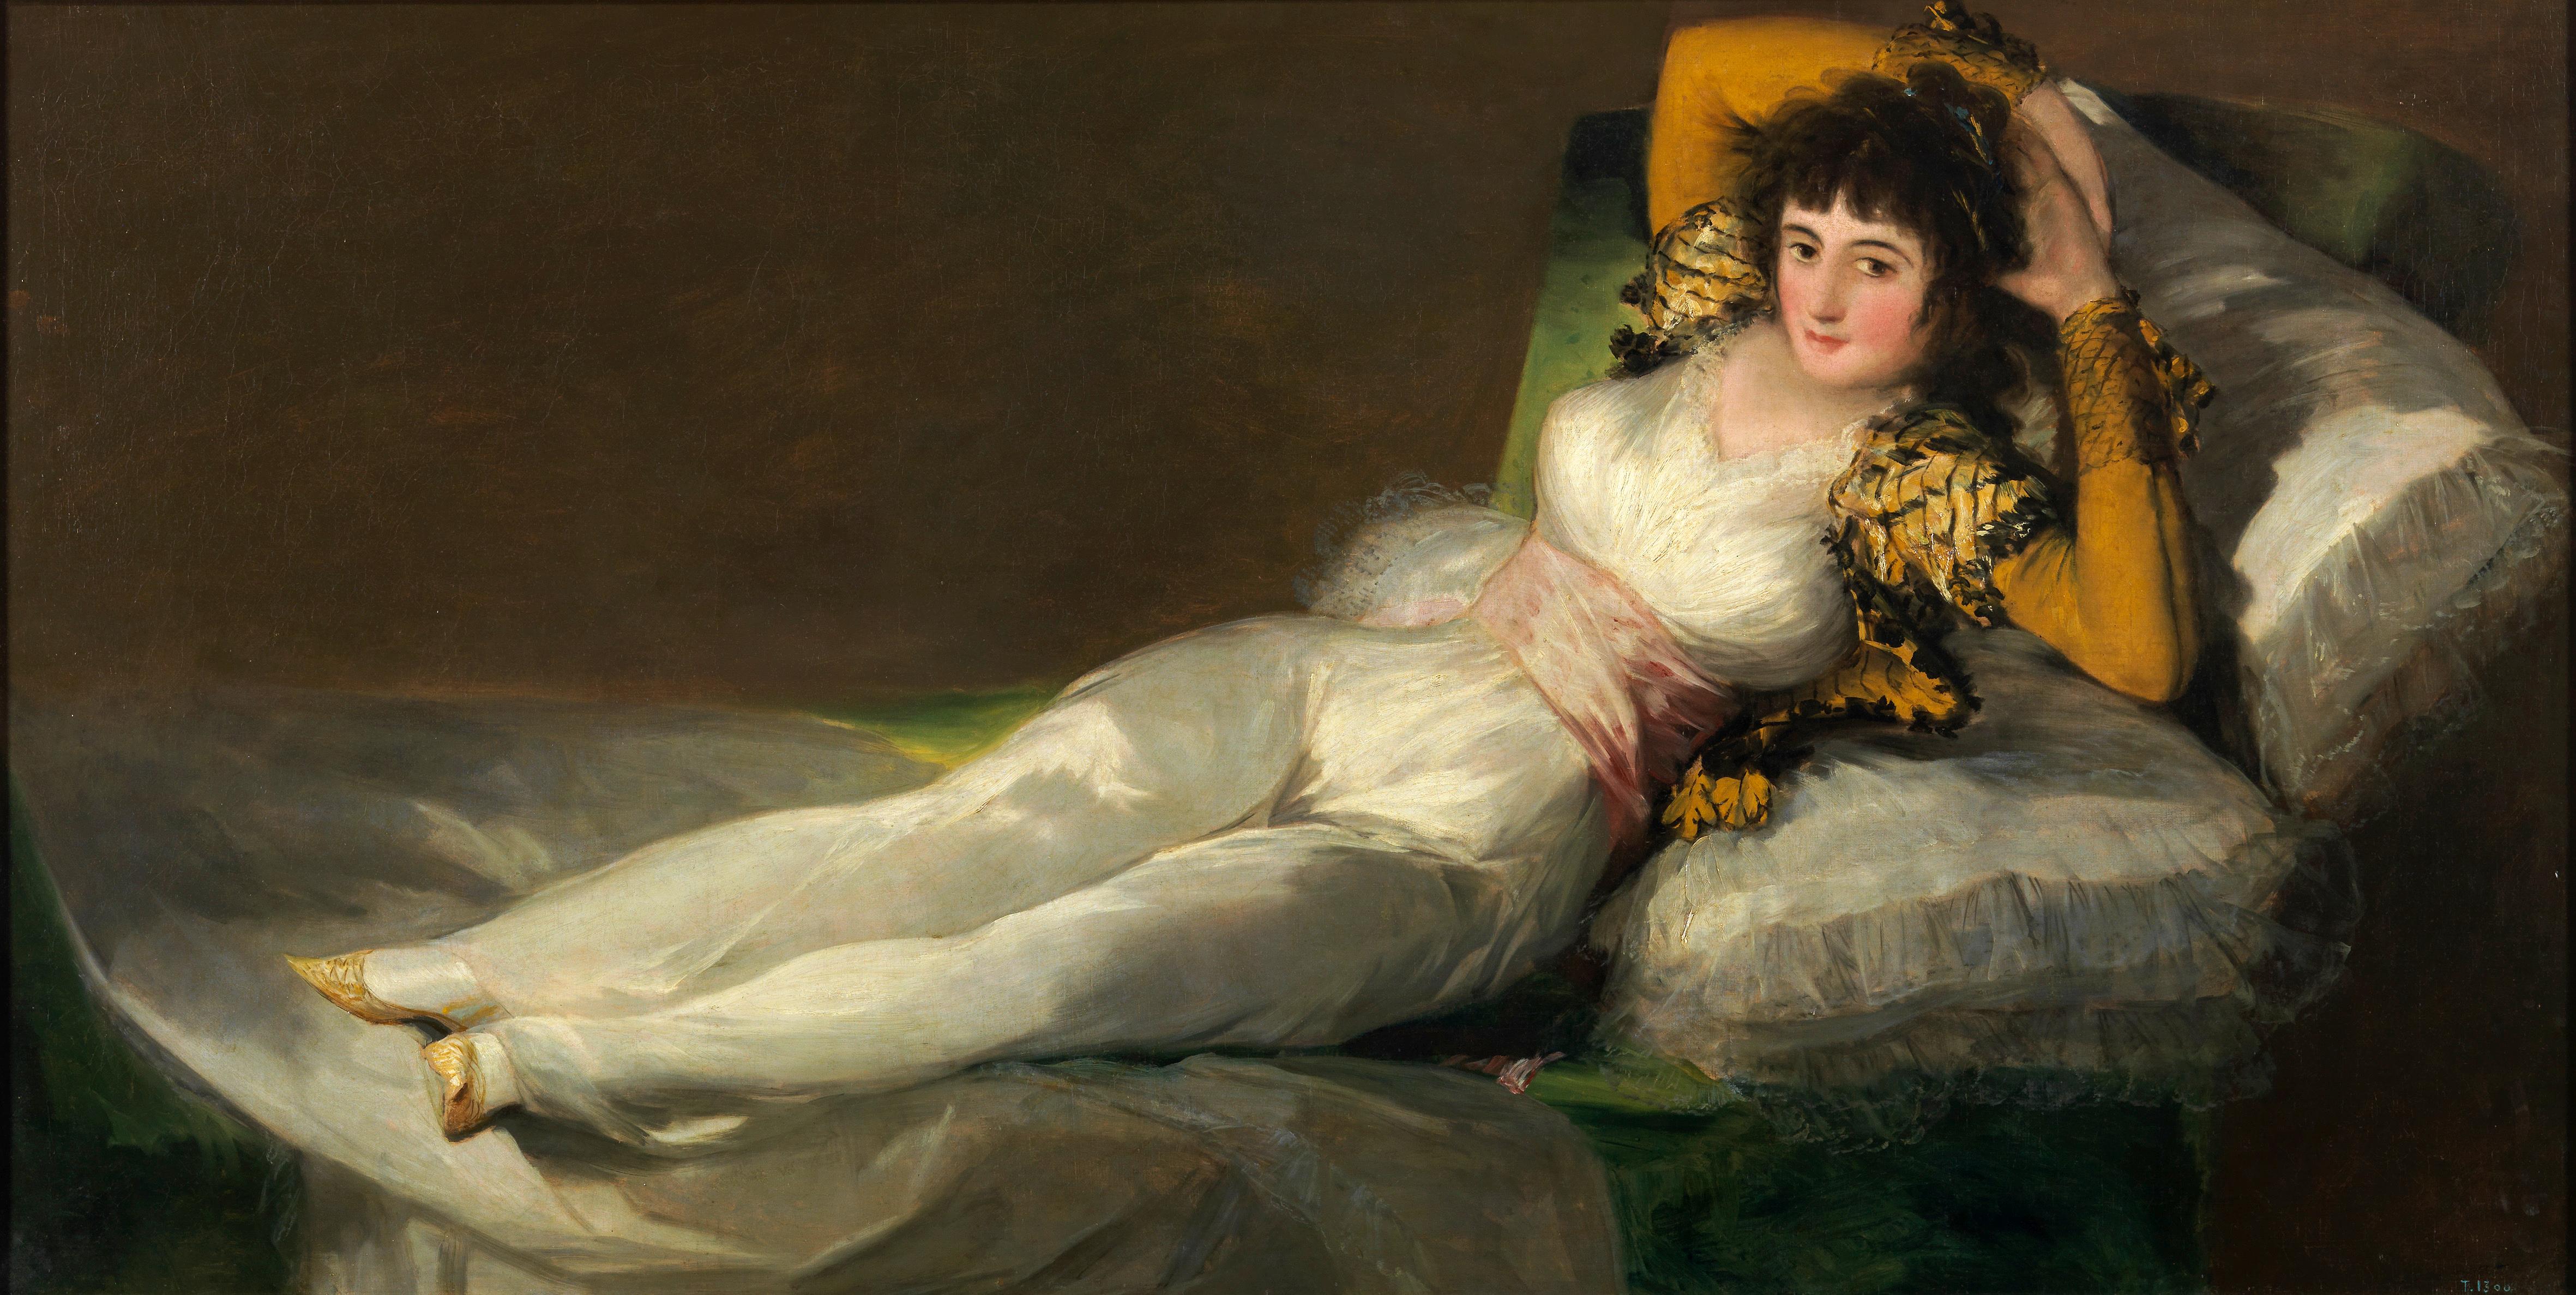 La maja desnuda - Coleccin - Museo Nacional del Prado